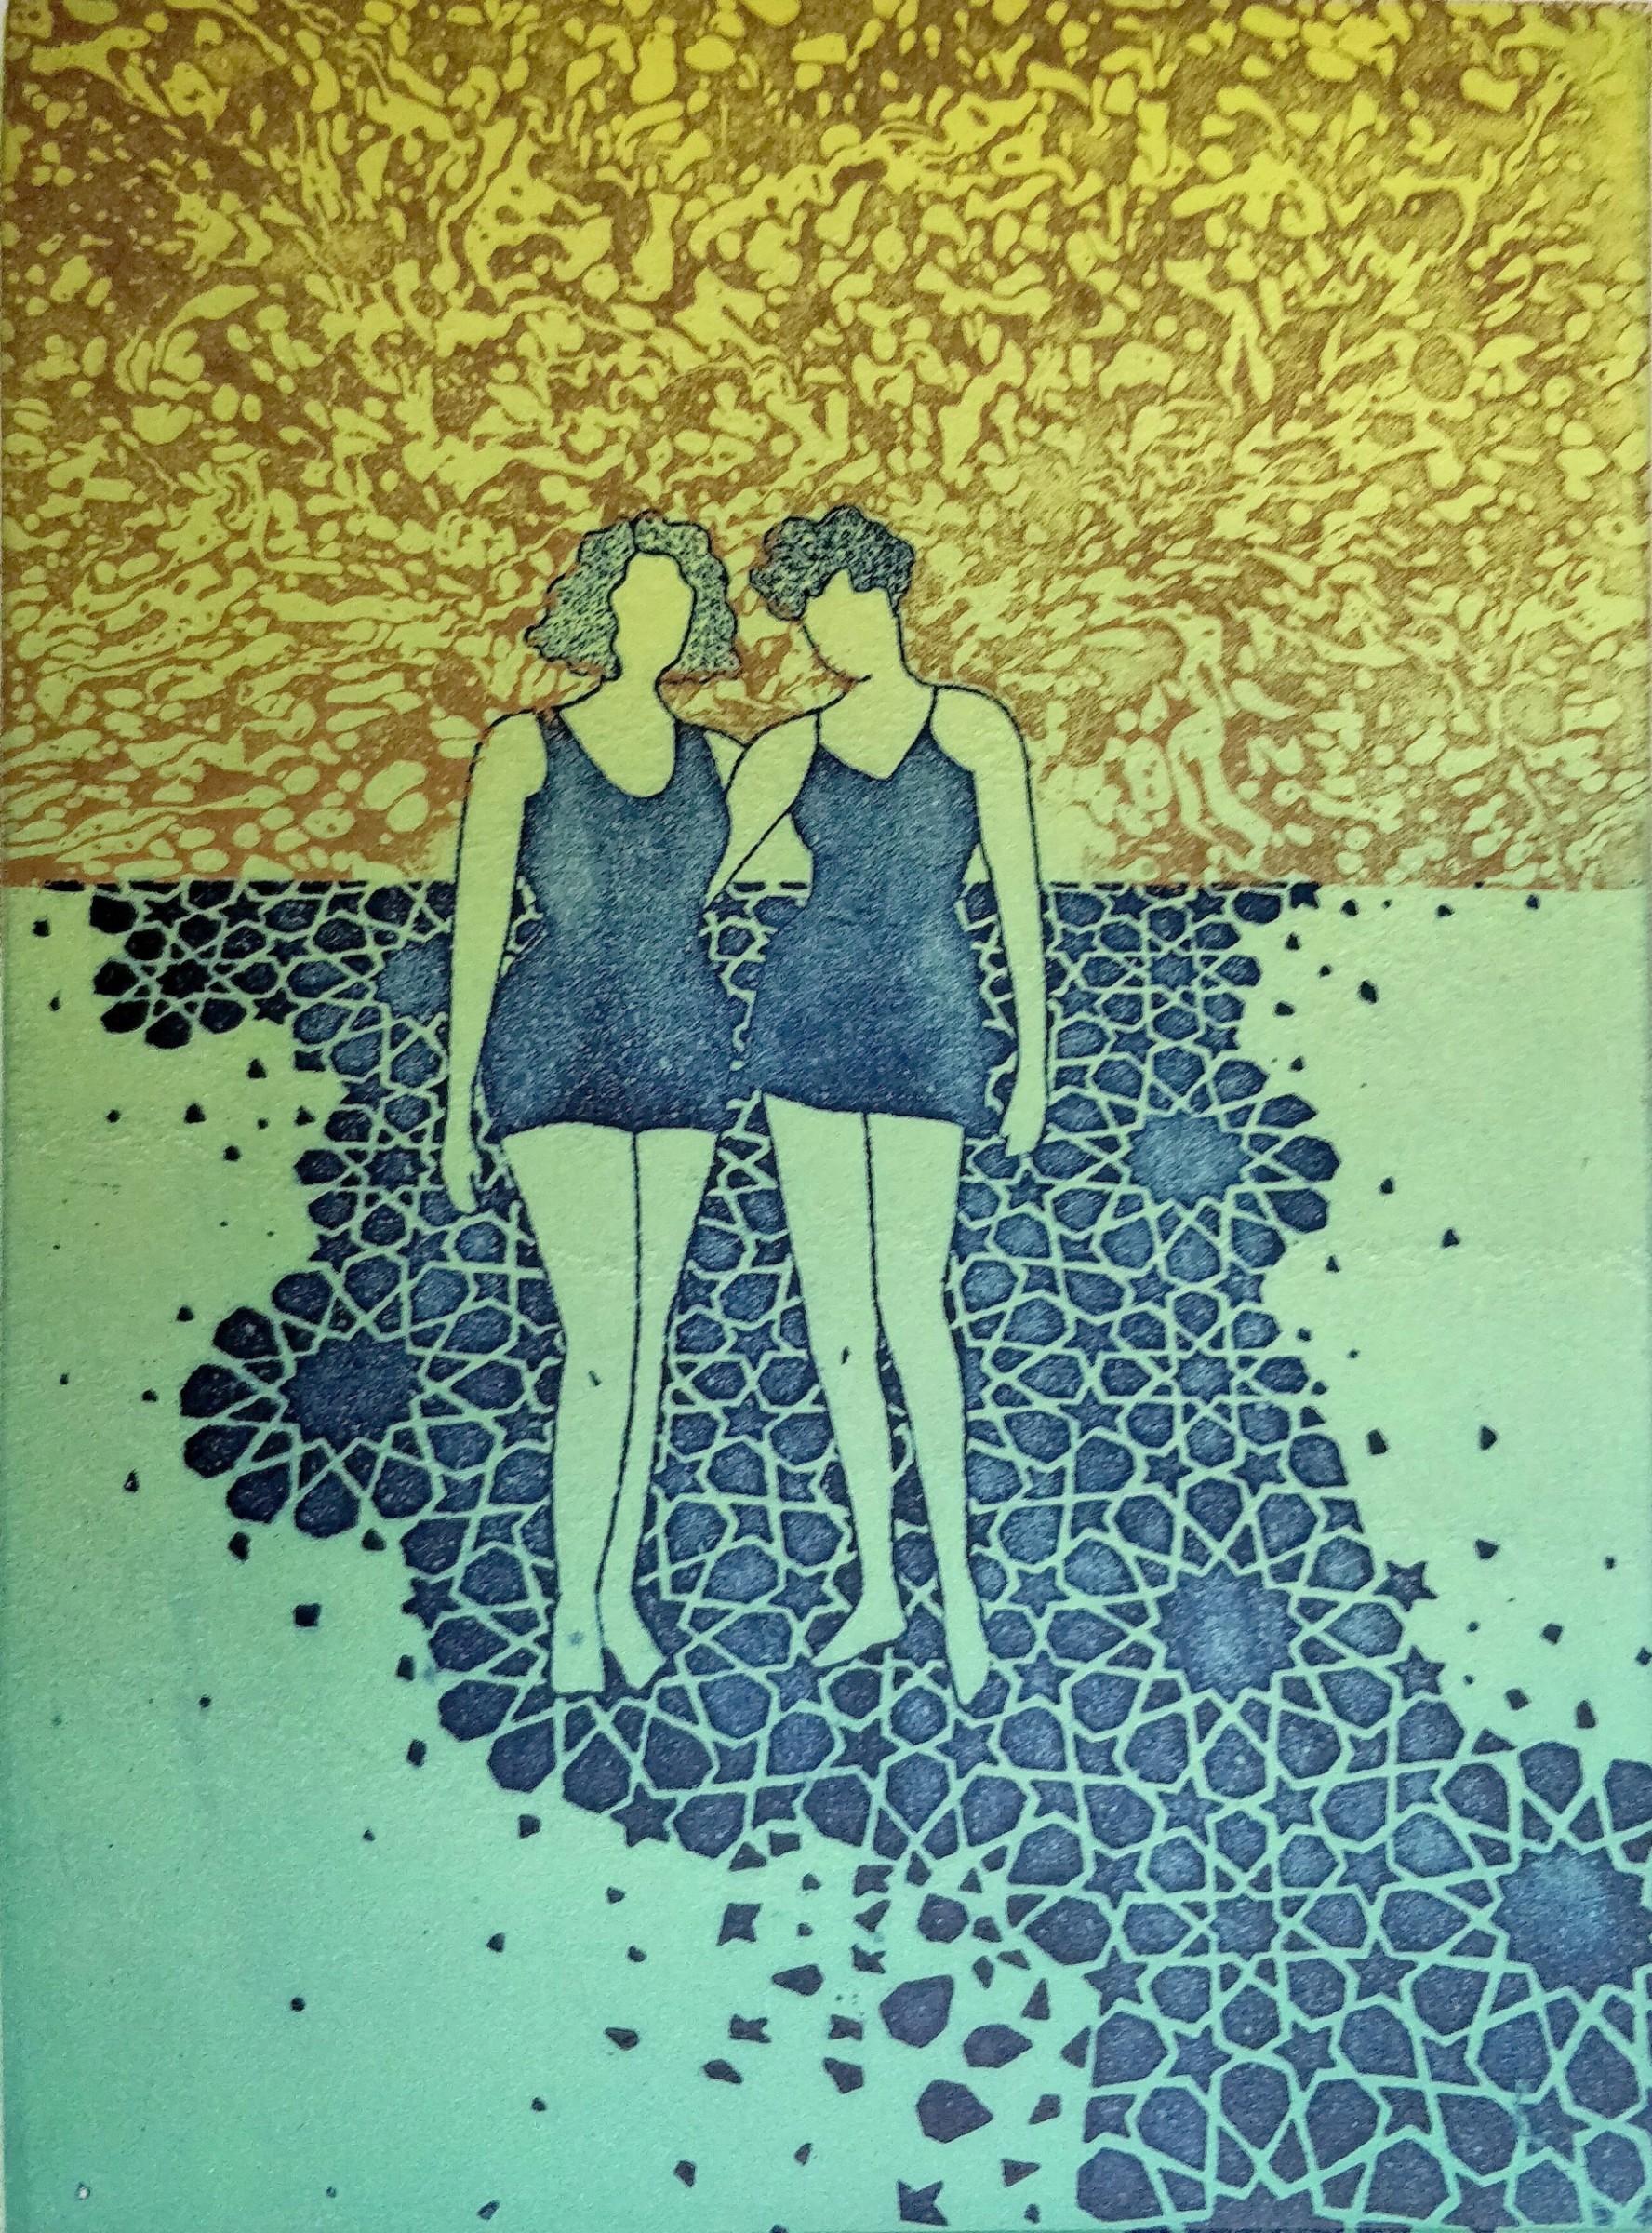 "<span class=""link fancybox-details-link""><a href=""/artists/212-giulia-zaniol-re/works/11339/"">View Detail Page</a></span><div class=""artist""><span class=""artist""><strong>Giulia Zaniol RE</strong></span></div><div class=""title""><em>Lido Sisters, Vanishing Memories</em></div><div class=""medium"">etching</div><div class=""dimensions"">20.5 x 15.4 cm</div><div class=""edition_details"">edition of 6</div><div class=""price"">£385.00 unframed</div>"